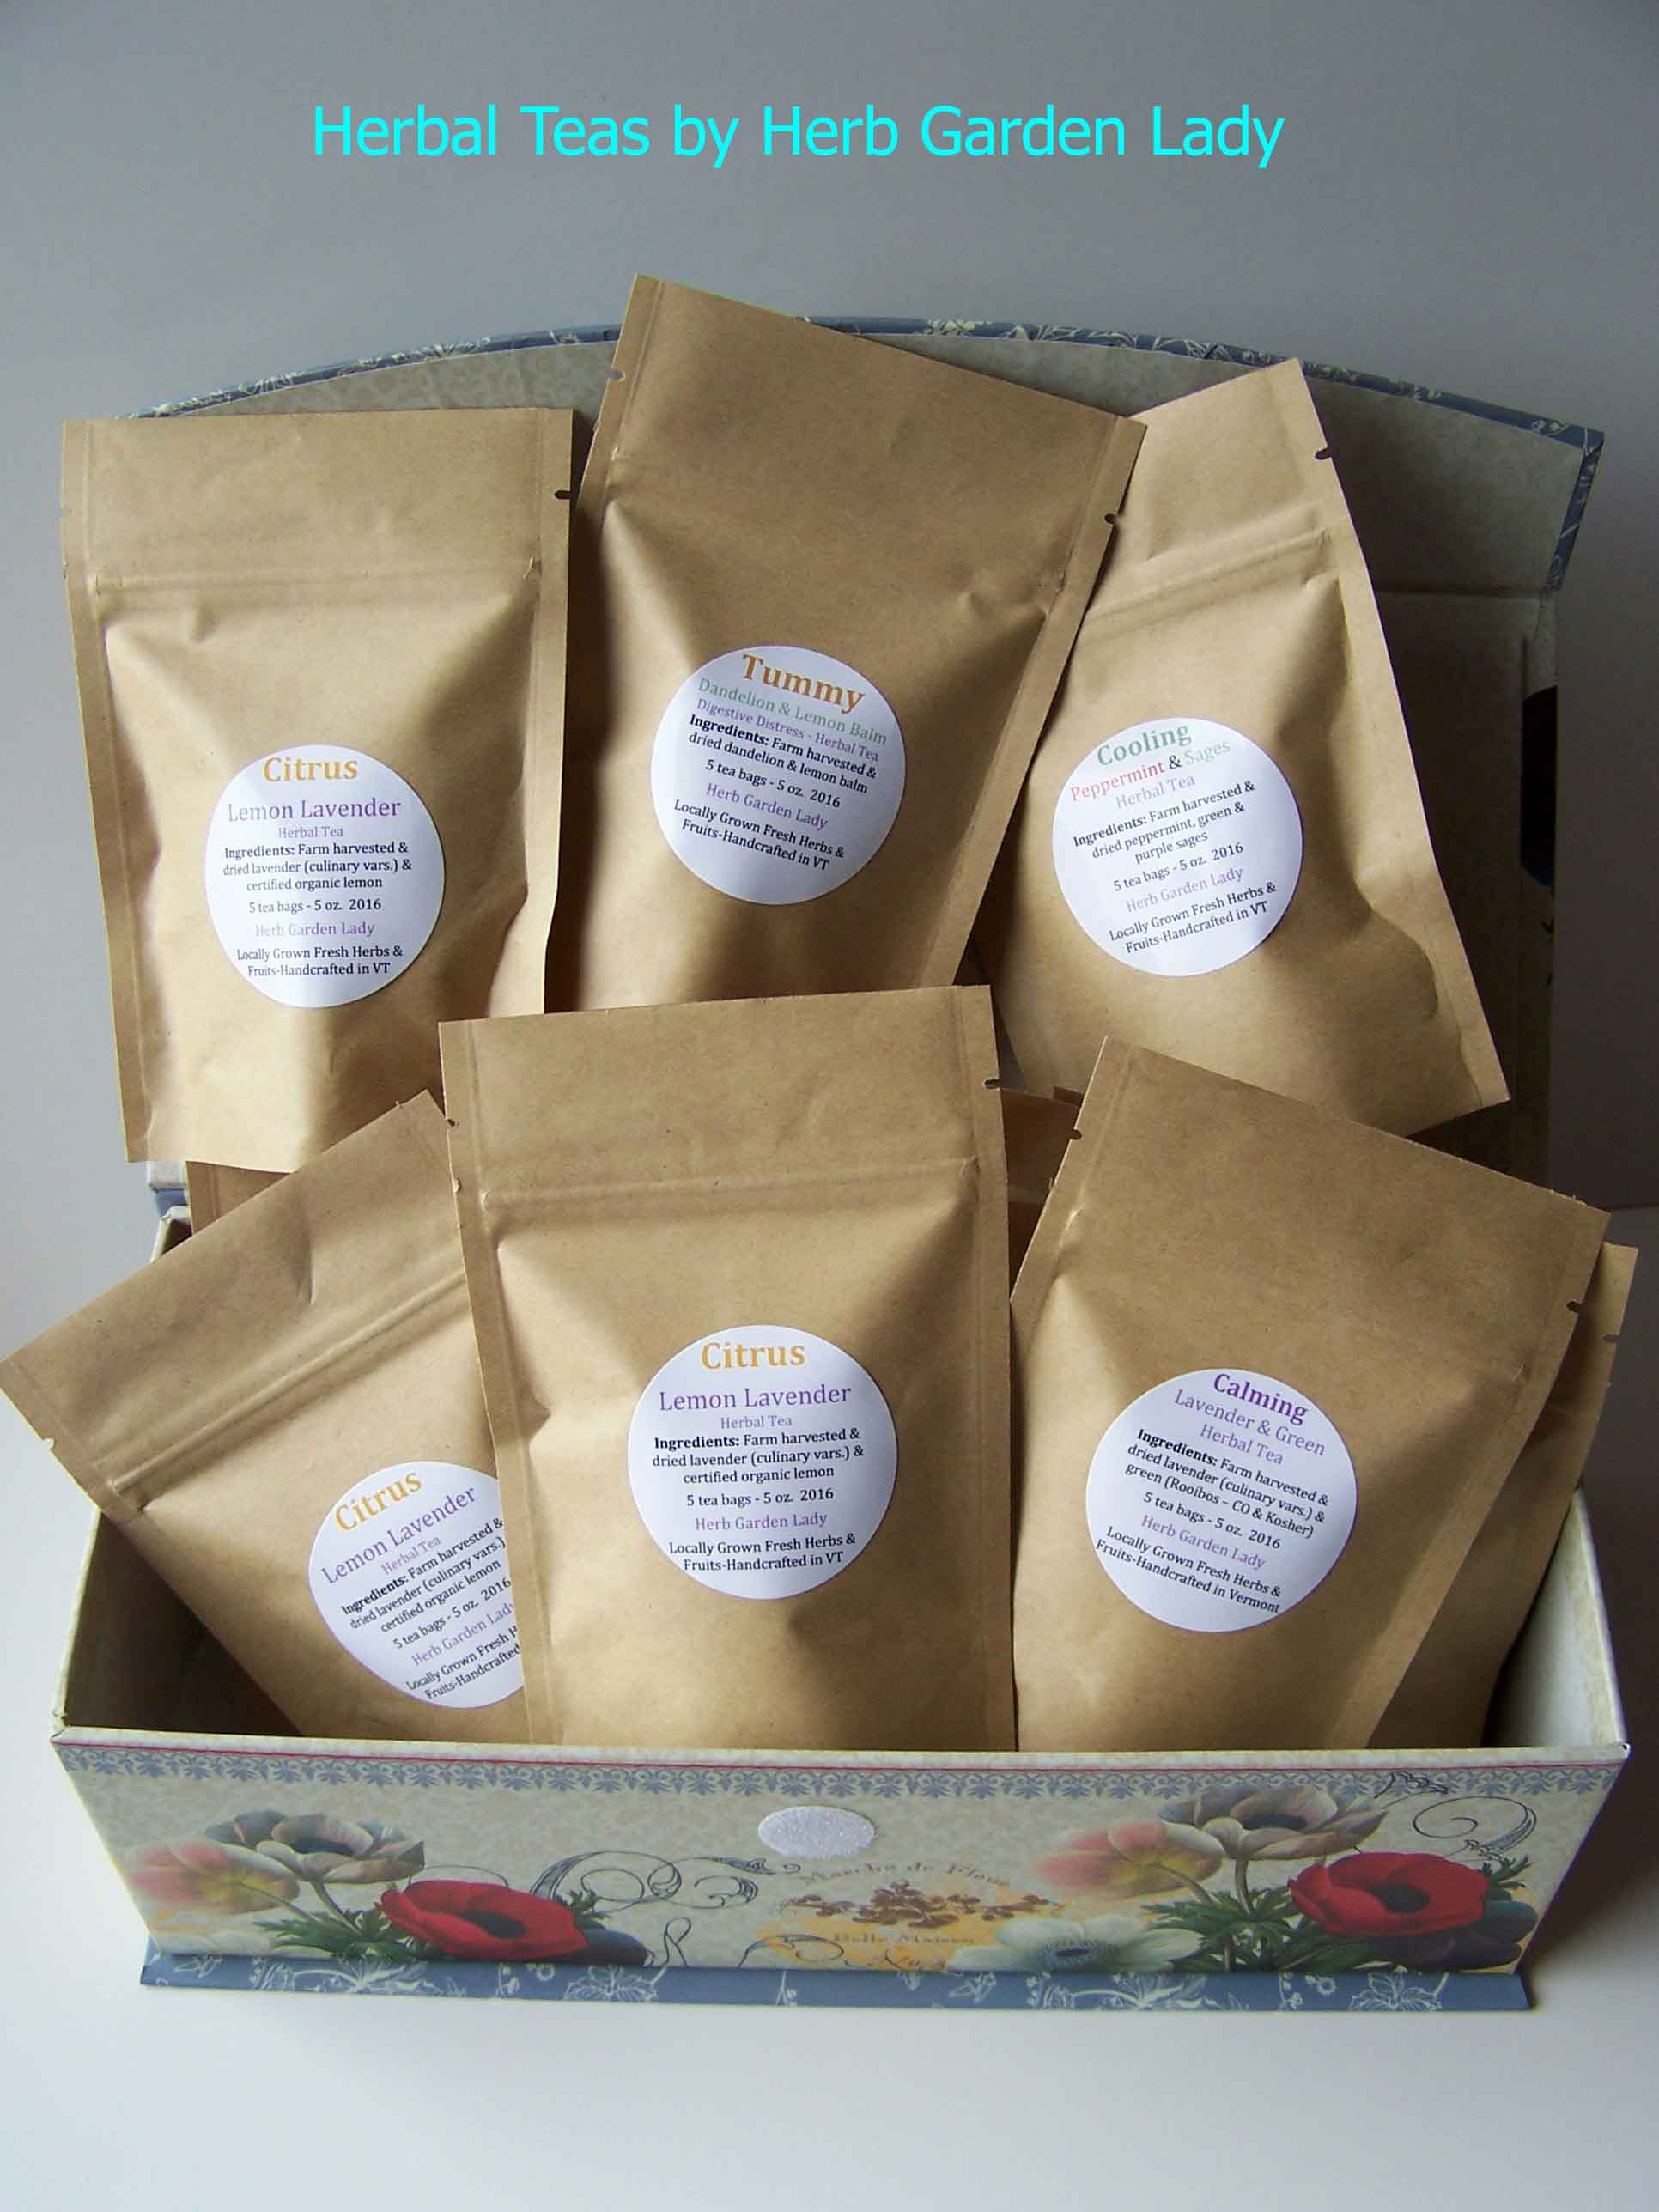 Herbal teas by Herb Garden Lady